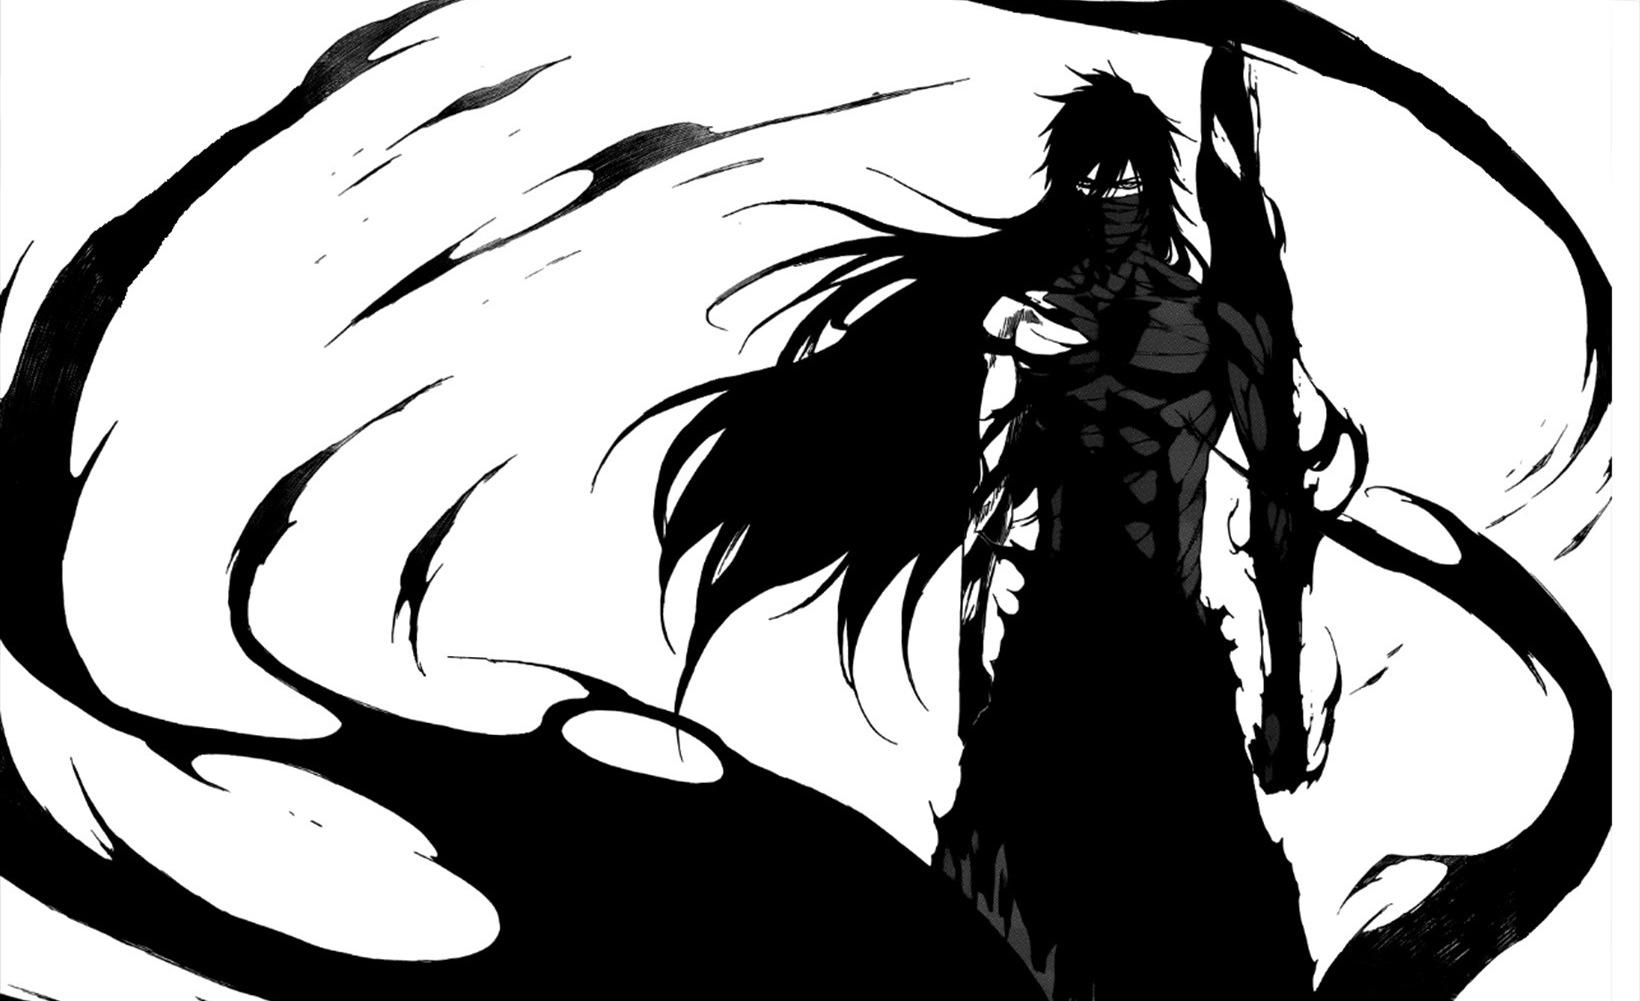 Wallpaper Drawing Illustration Anime Silhouette Demon Japanese Art ART Graphics Artworks Black And White Monochrome Photography Vertebrate